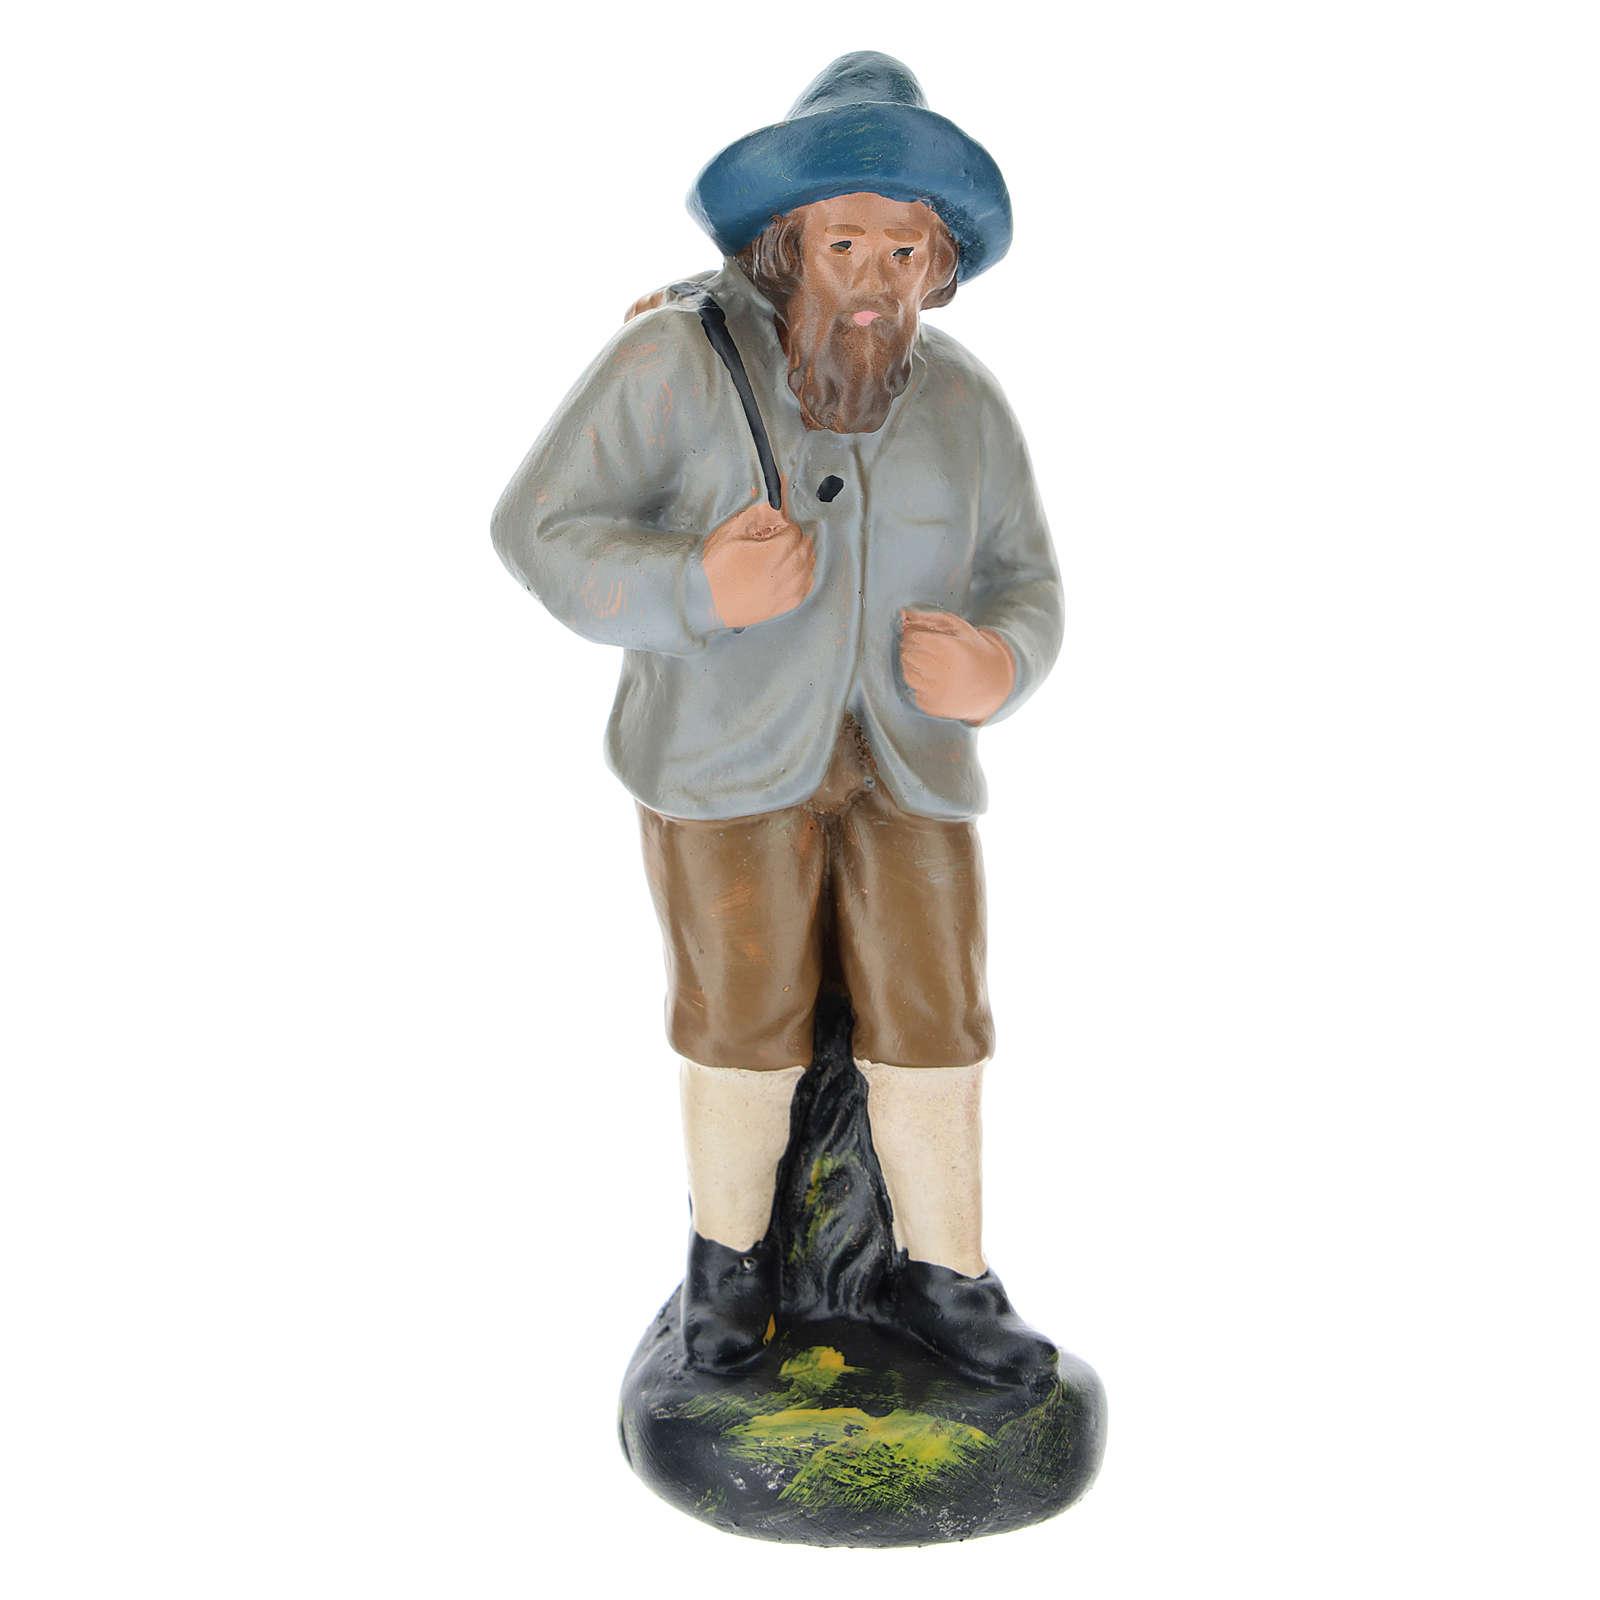 Estatua pastor con sombrero y saco yeso coloreado belenes 10 cm Barsanti 4